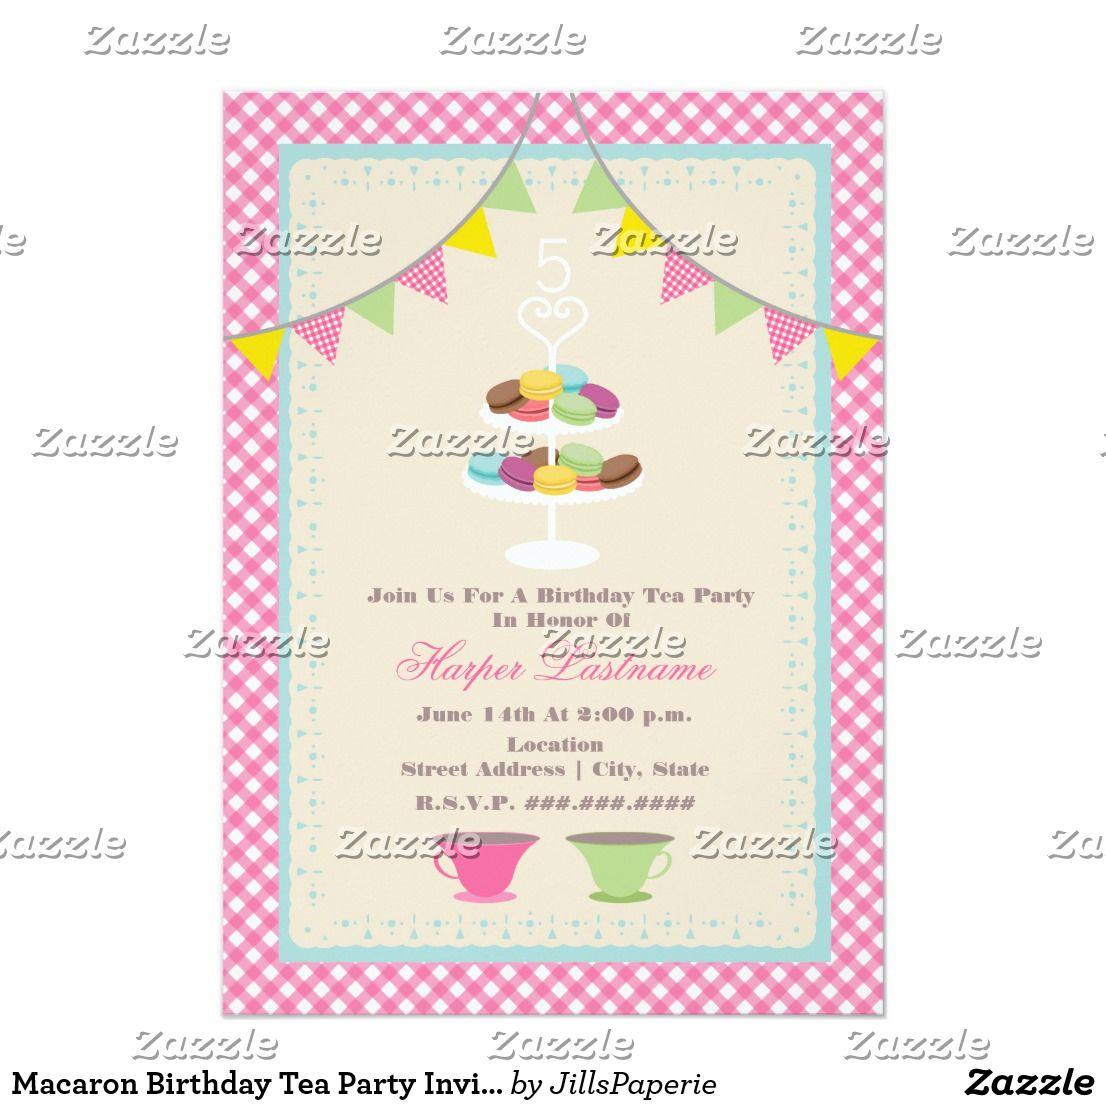 Macaron birthday tea party invitation pink gingham pinterest macaron birthday tea party invitation pink gingham a birthday party invitation featuring a tea party theme stopboris Choice Image